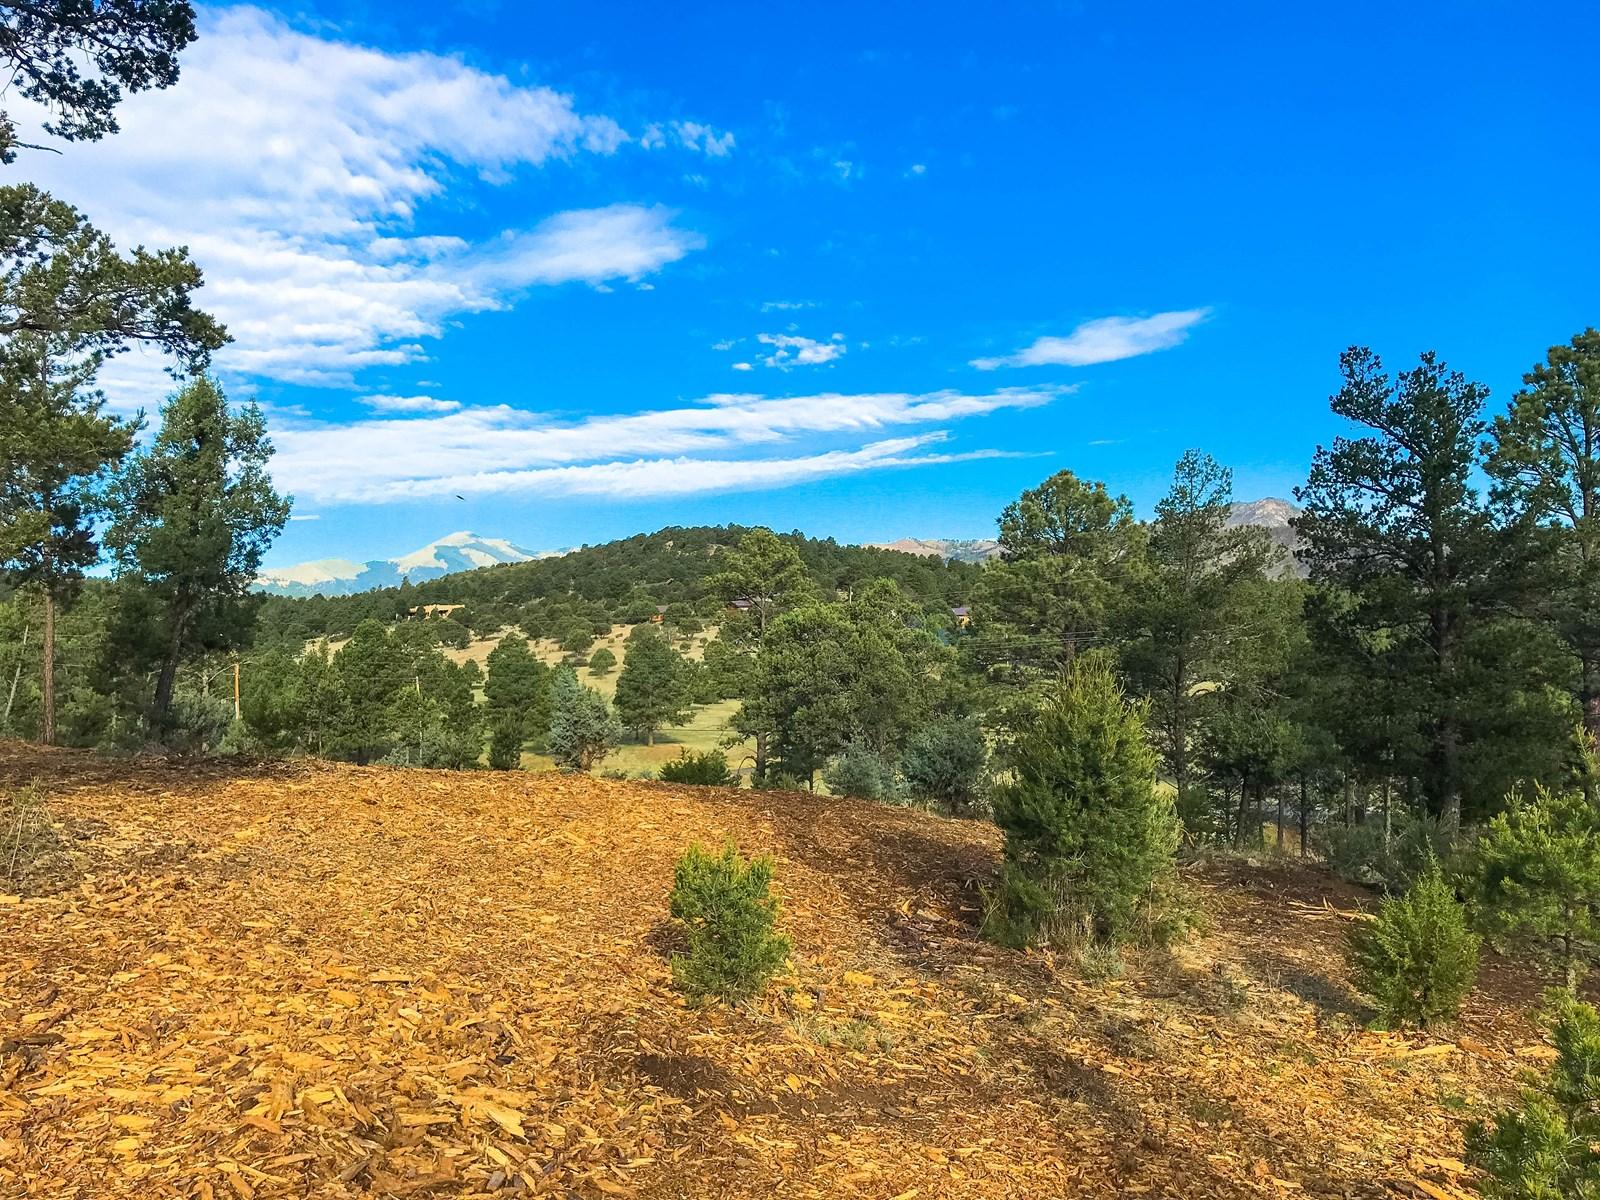 Land in Alto, NM, Land in Lincoln County, Land near Ruidoso